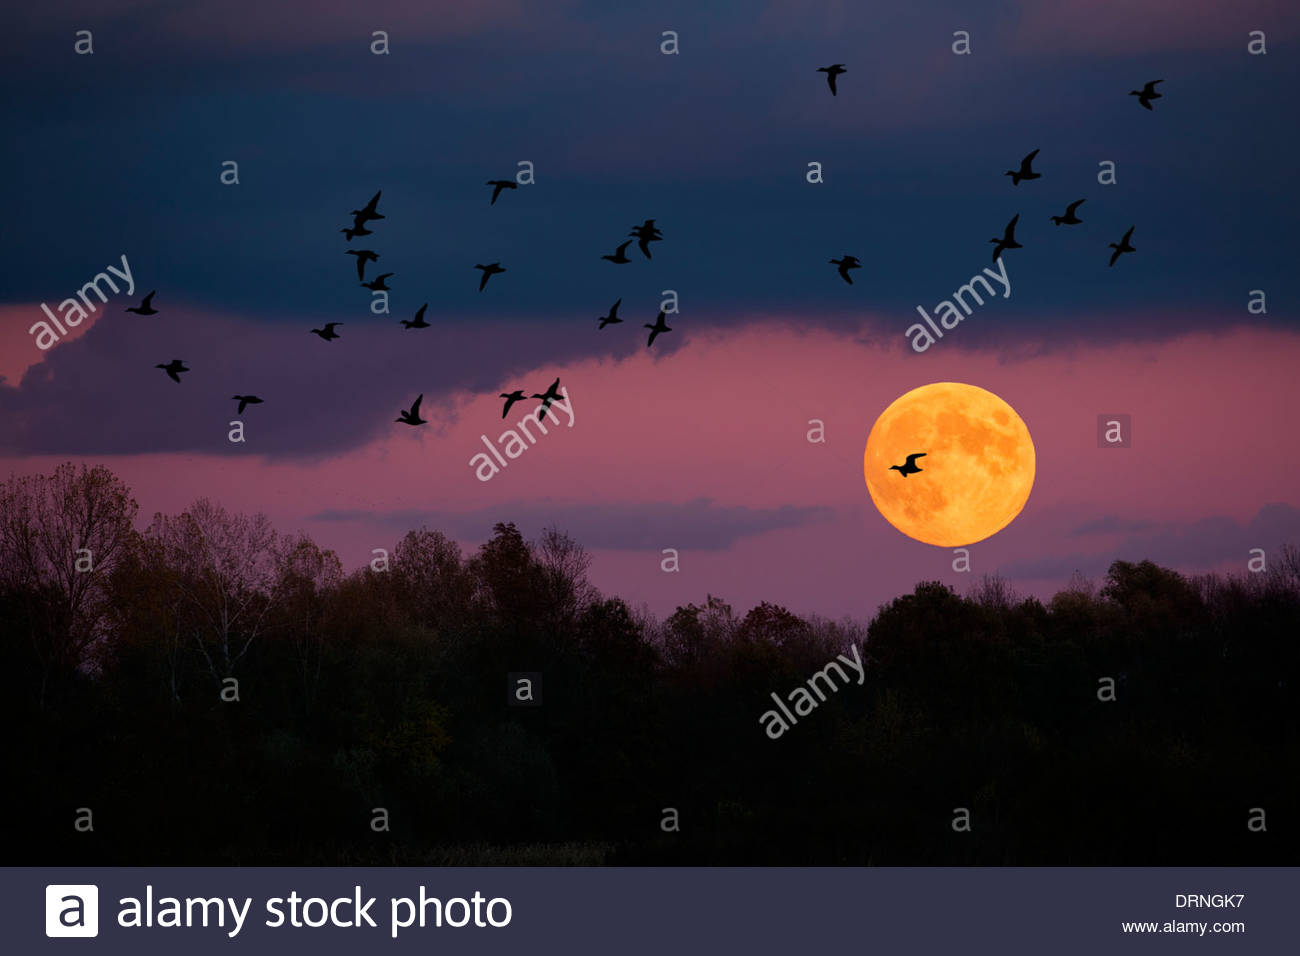 Flock of ducks fly over fool moon. - Stock Image